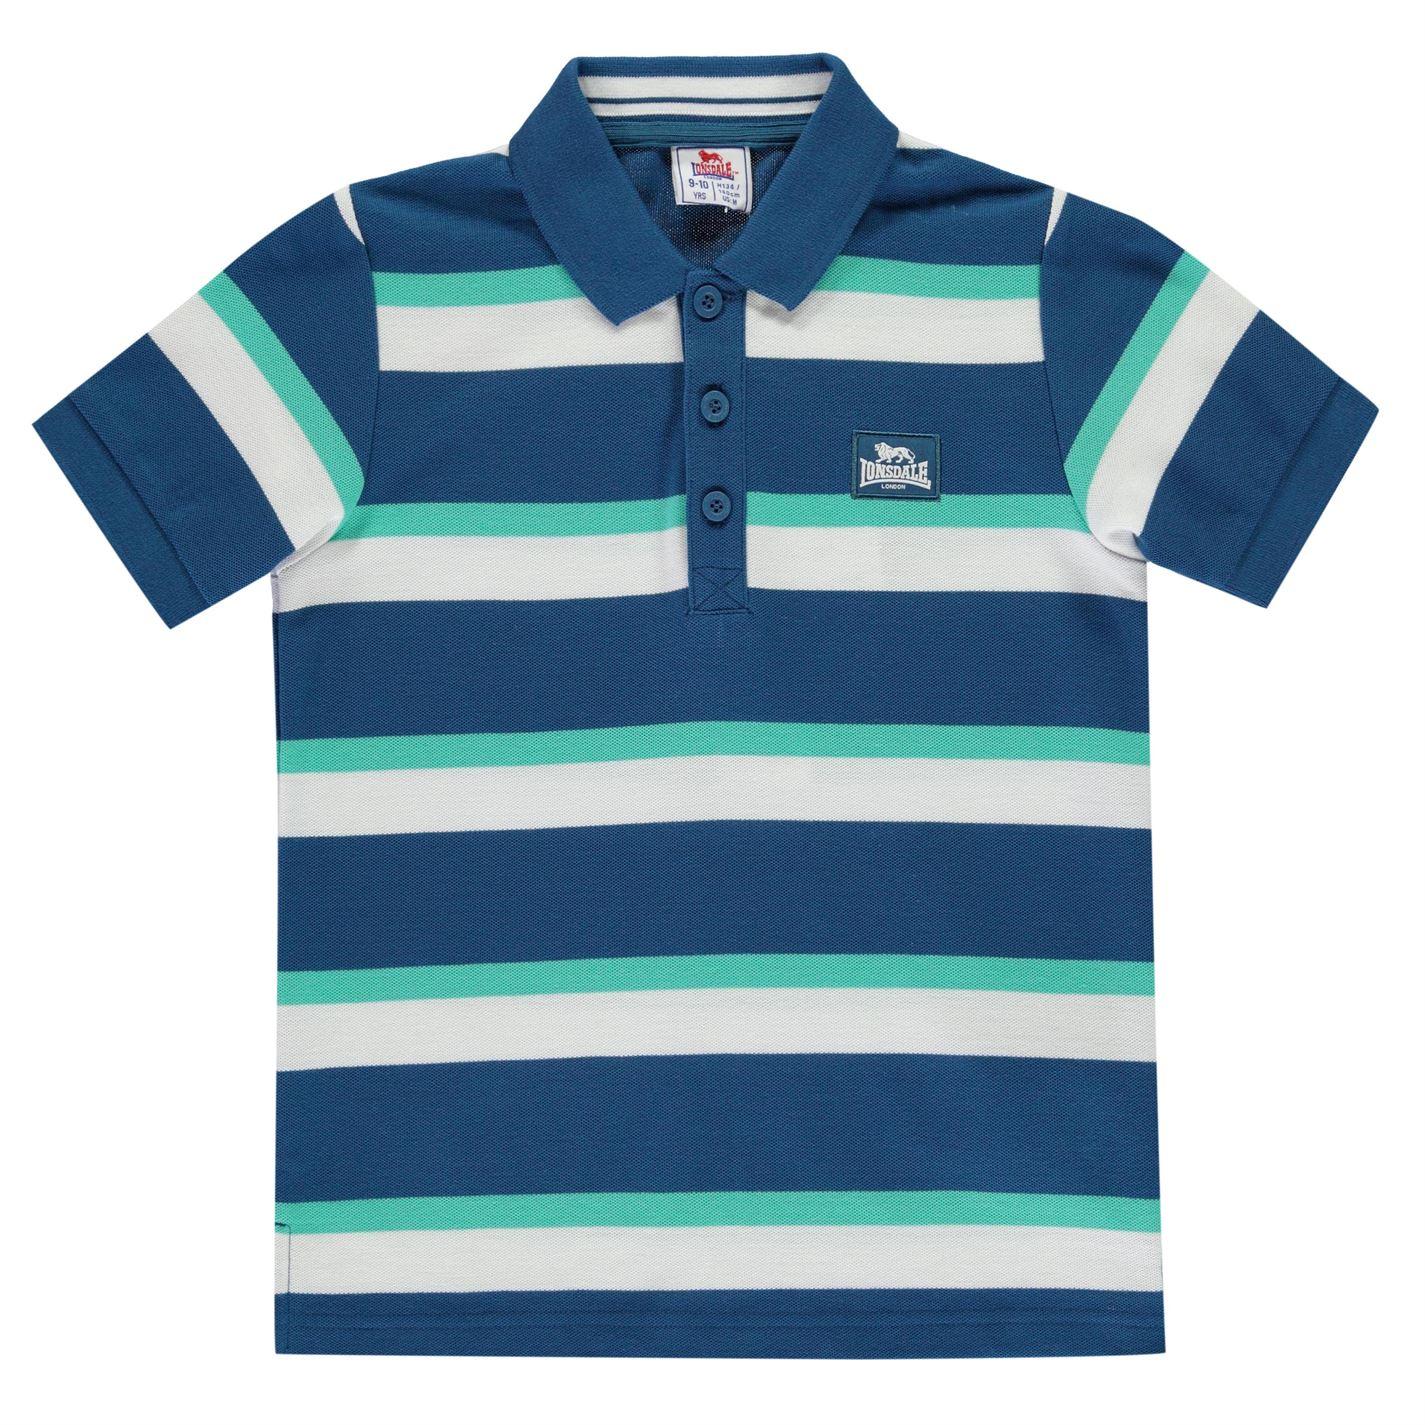 Polo majica Lonsdale Stripe Polo Junior Boys Blue Teal - Jeftinije.hr 28f0ce9430e